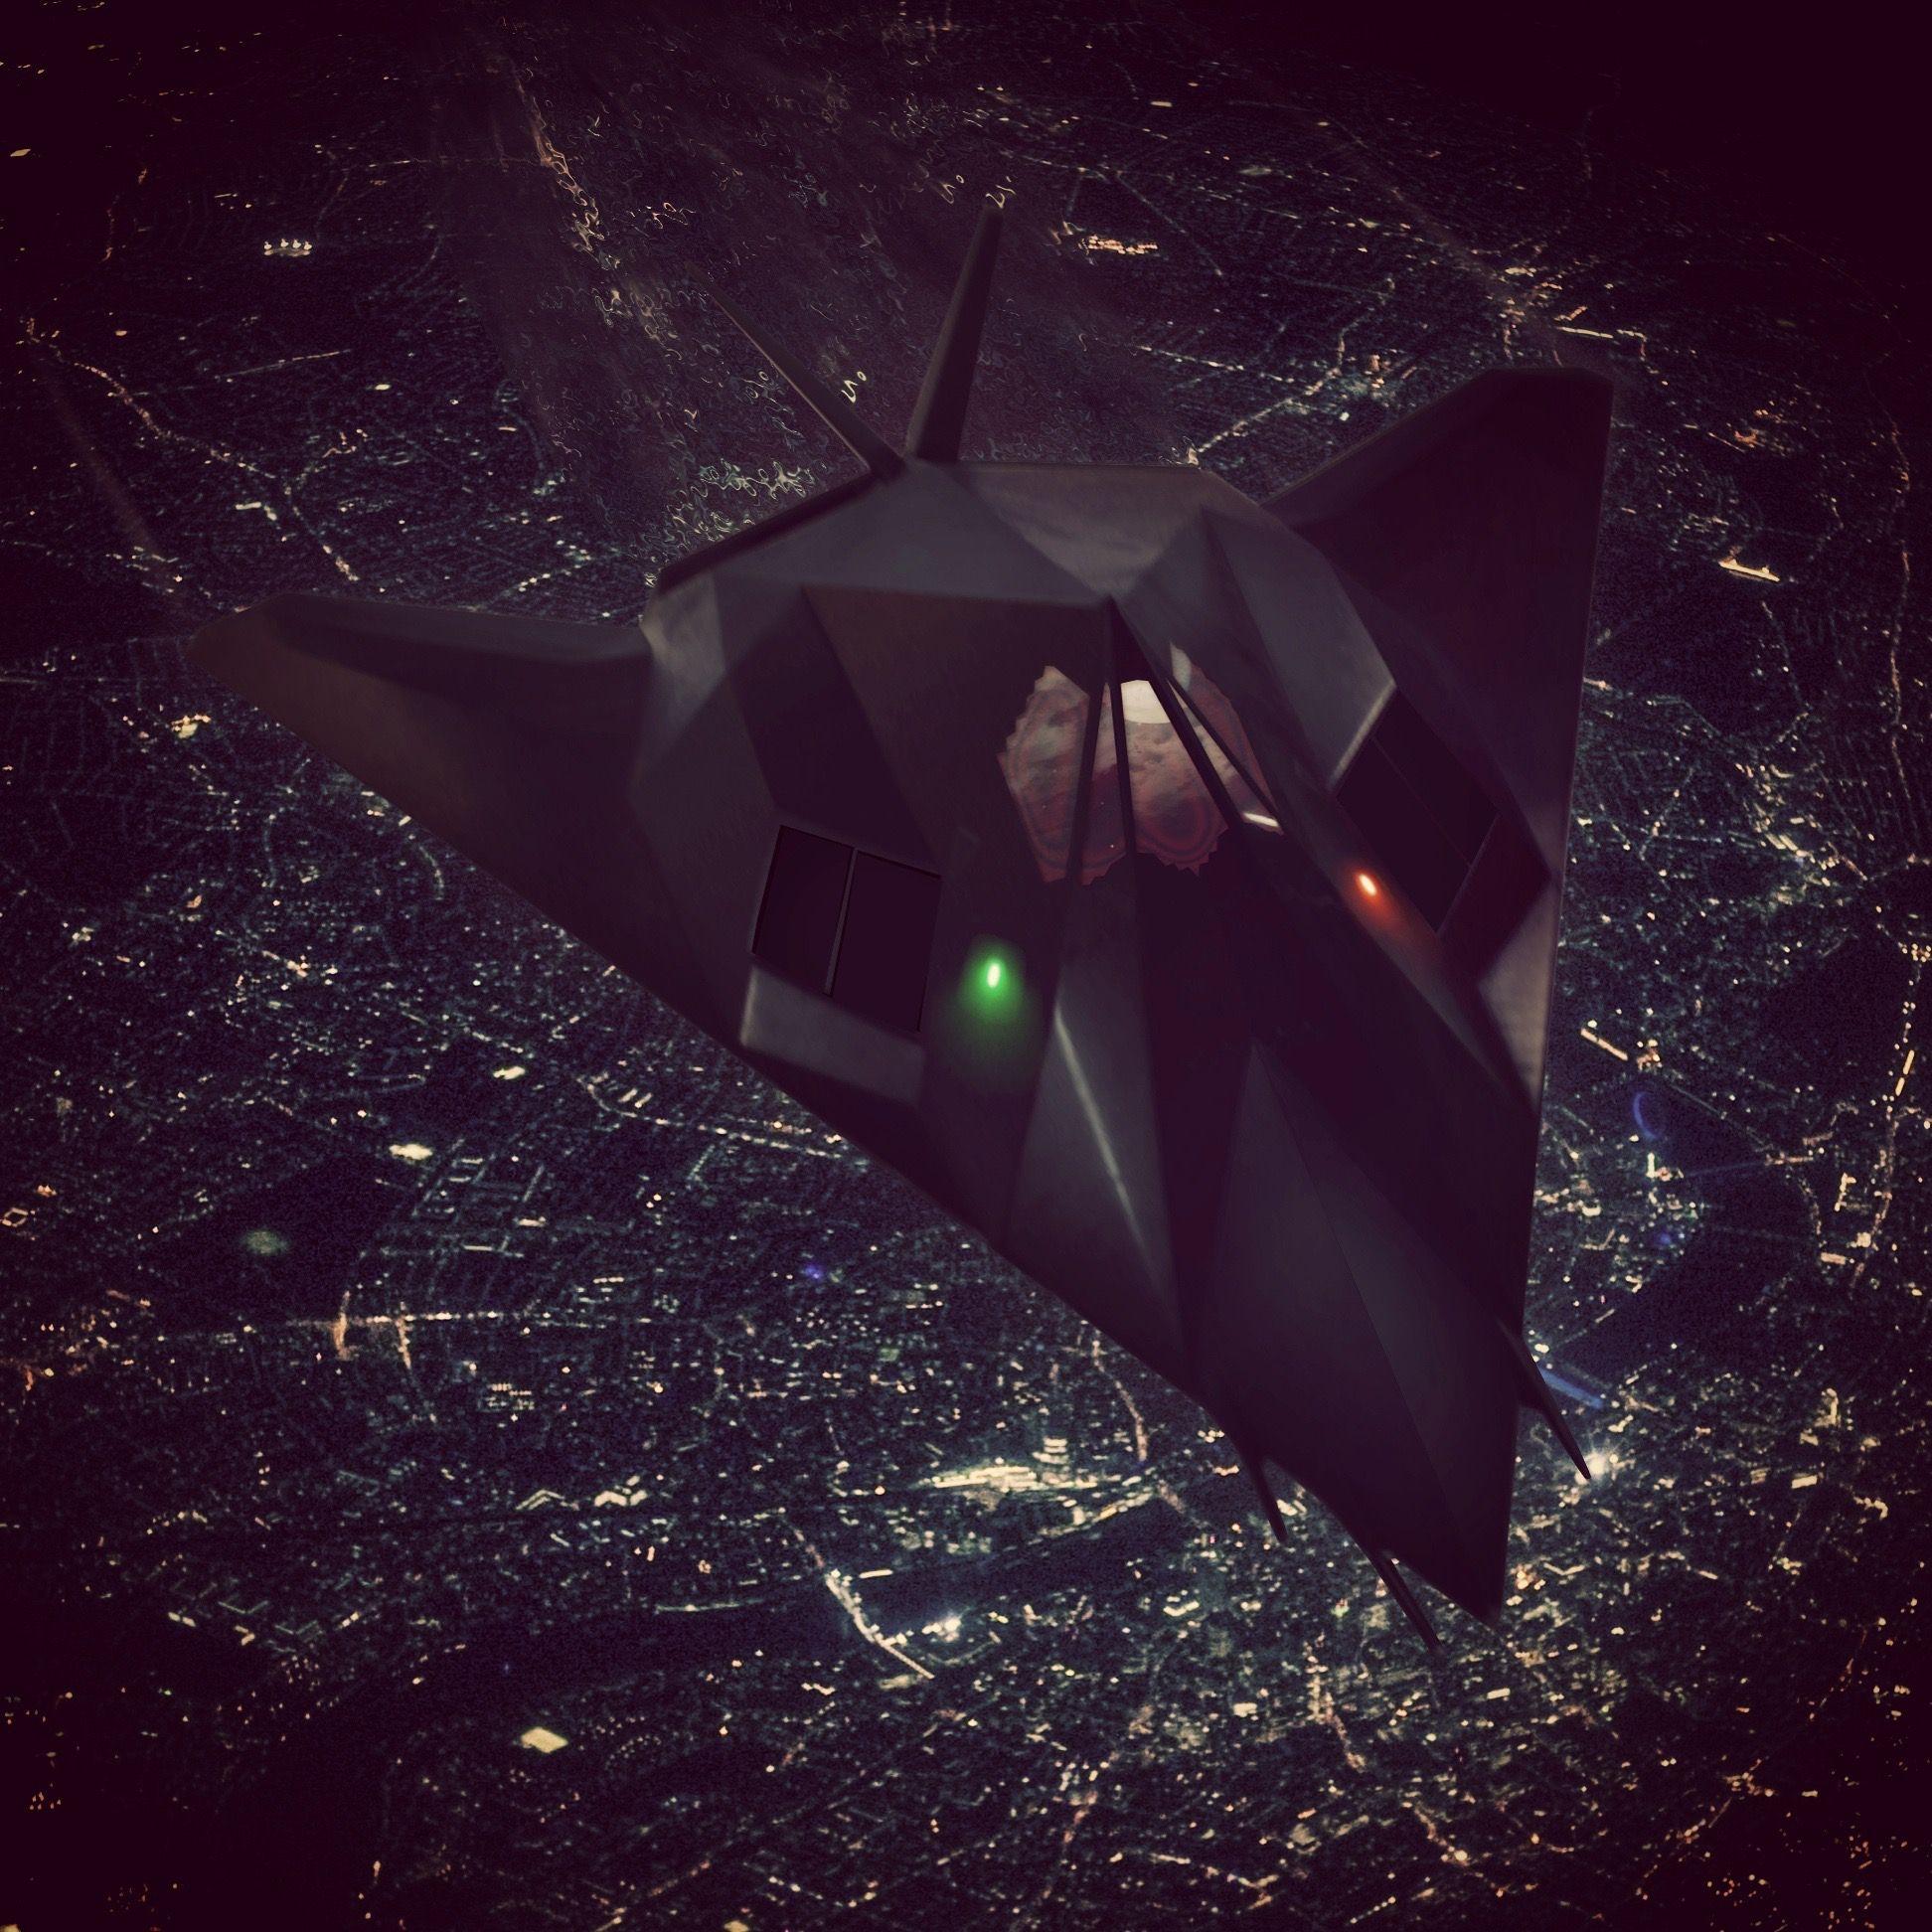 Lockheed F117A Nighthawk Stealth Fighter fibreglass model